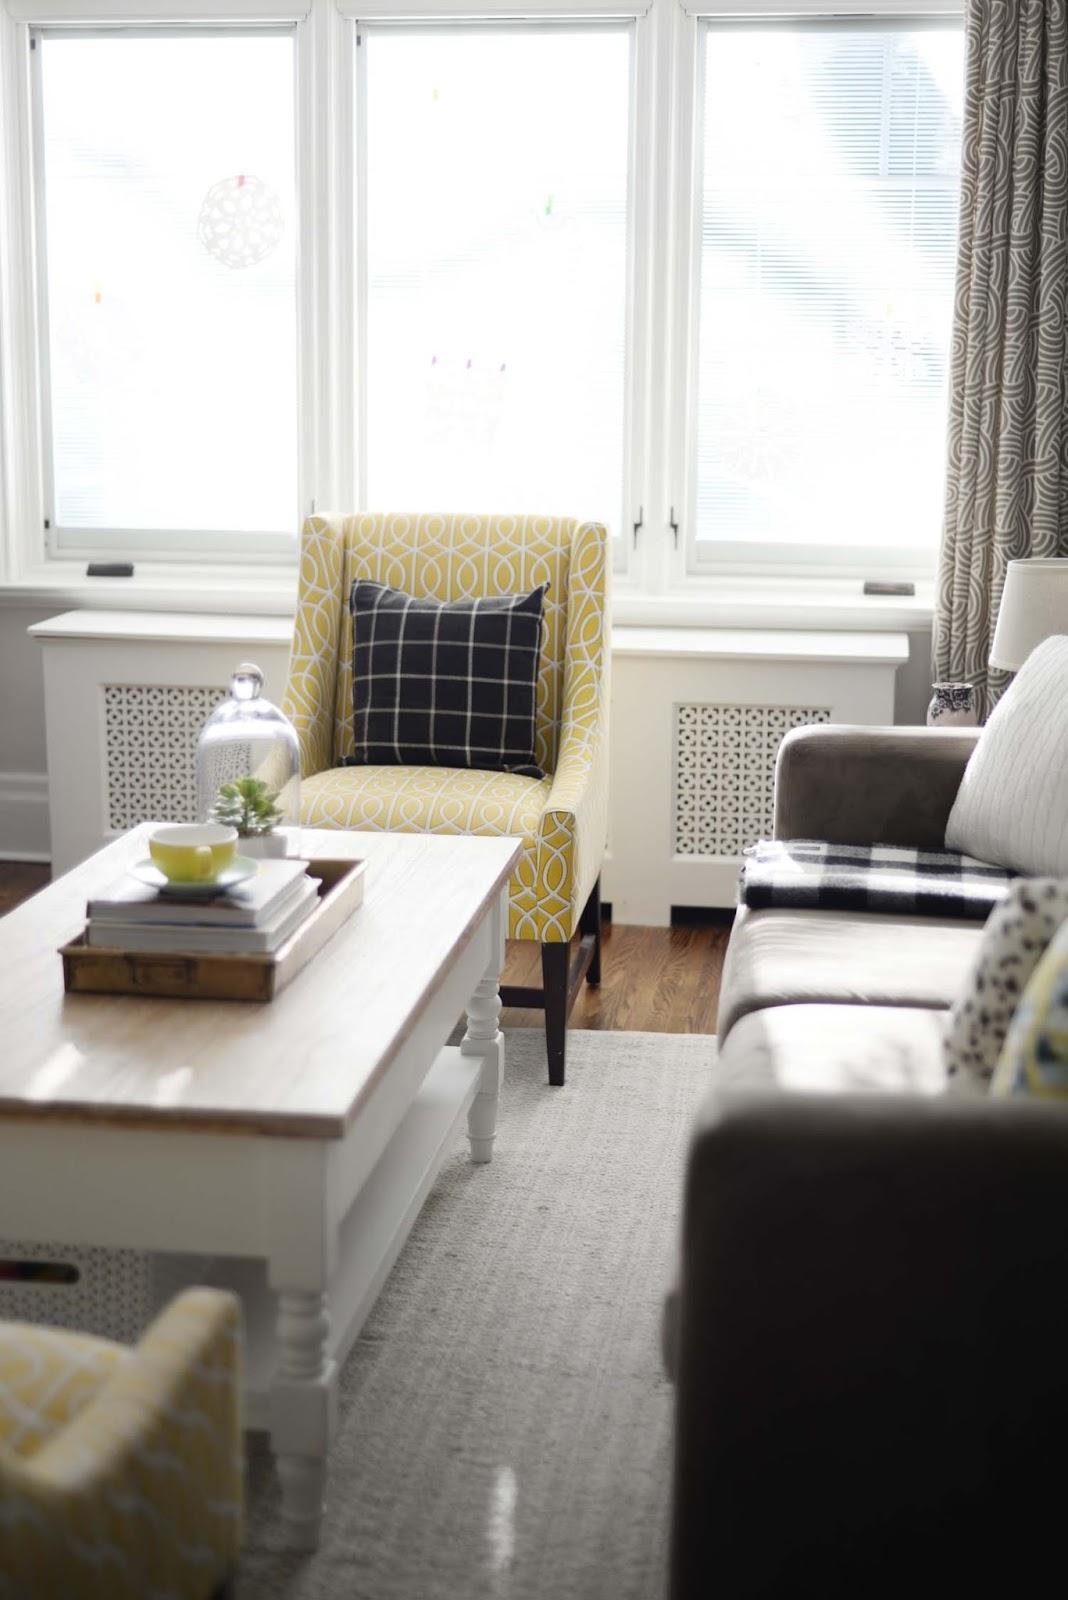 Wayfair Winter Refresh | Living room windows | Dwell Studio Gate chair | RamblingRenovators.ca